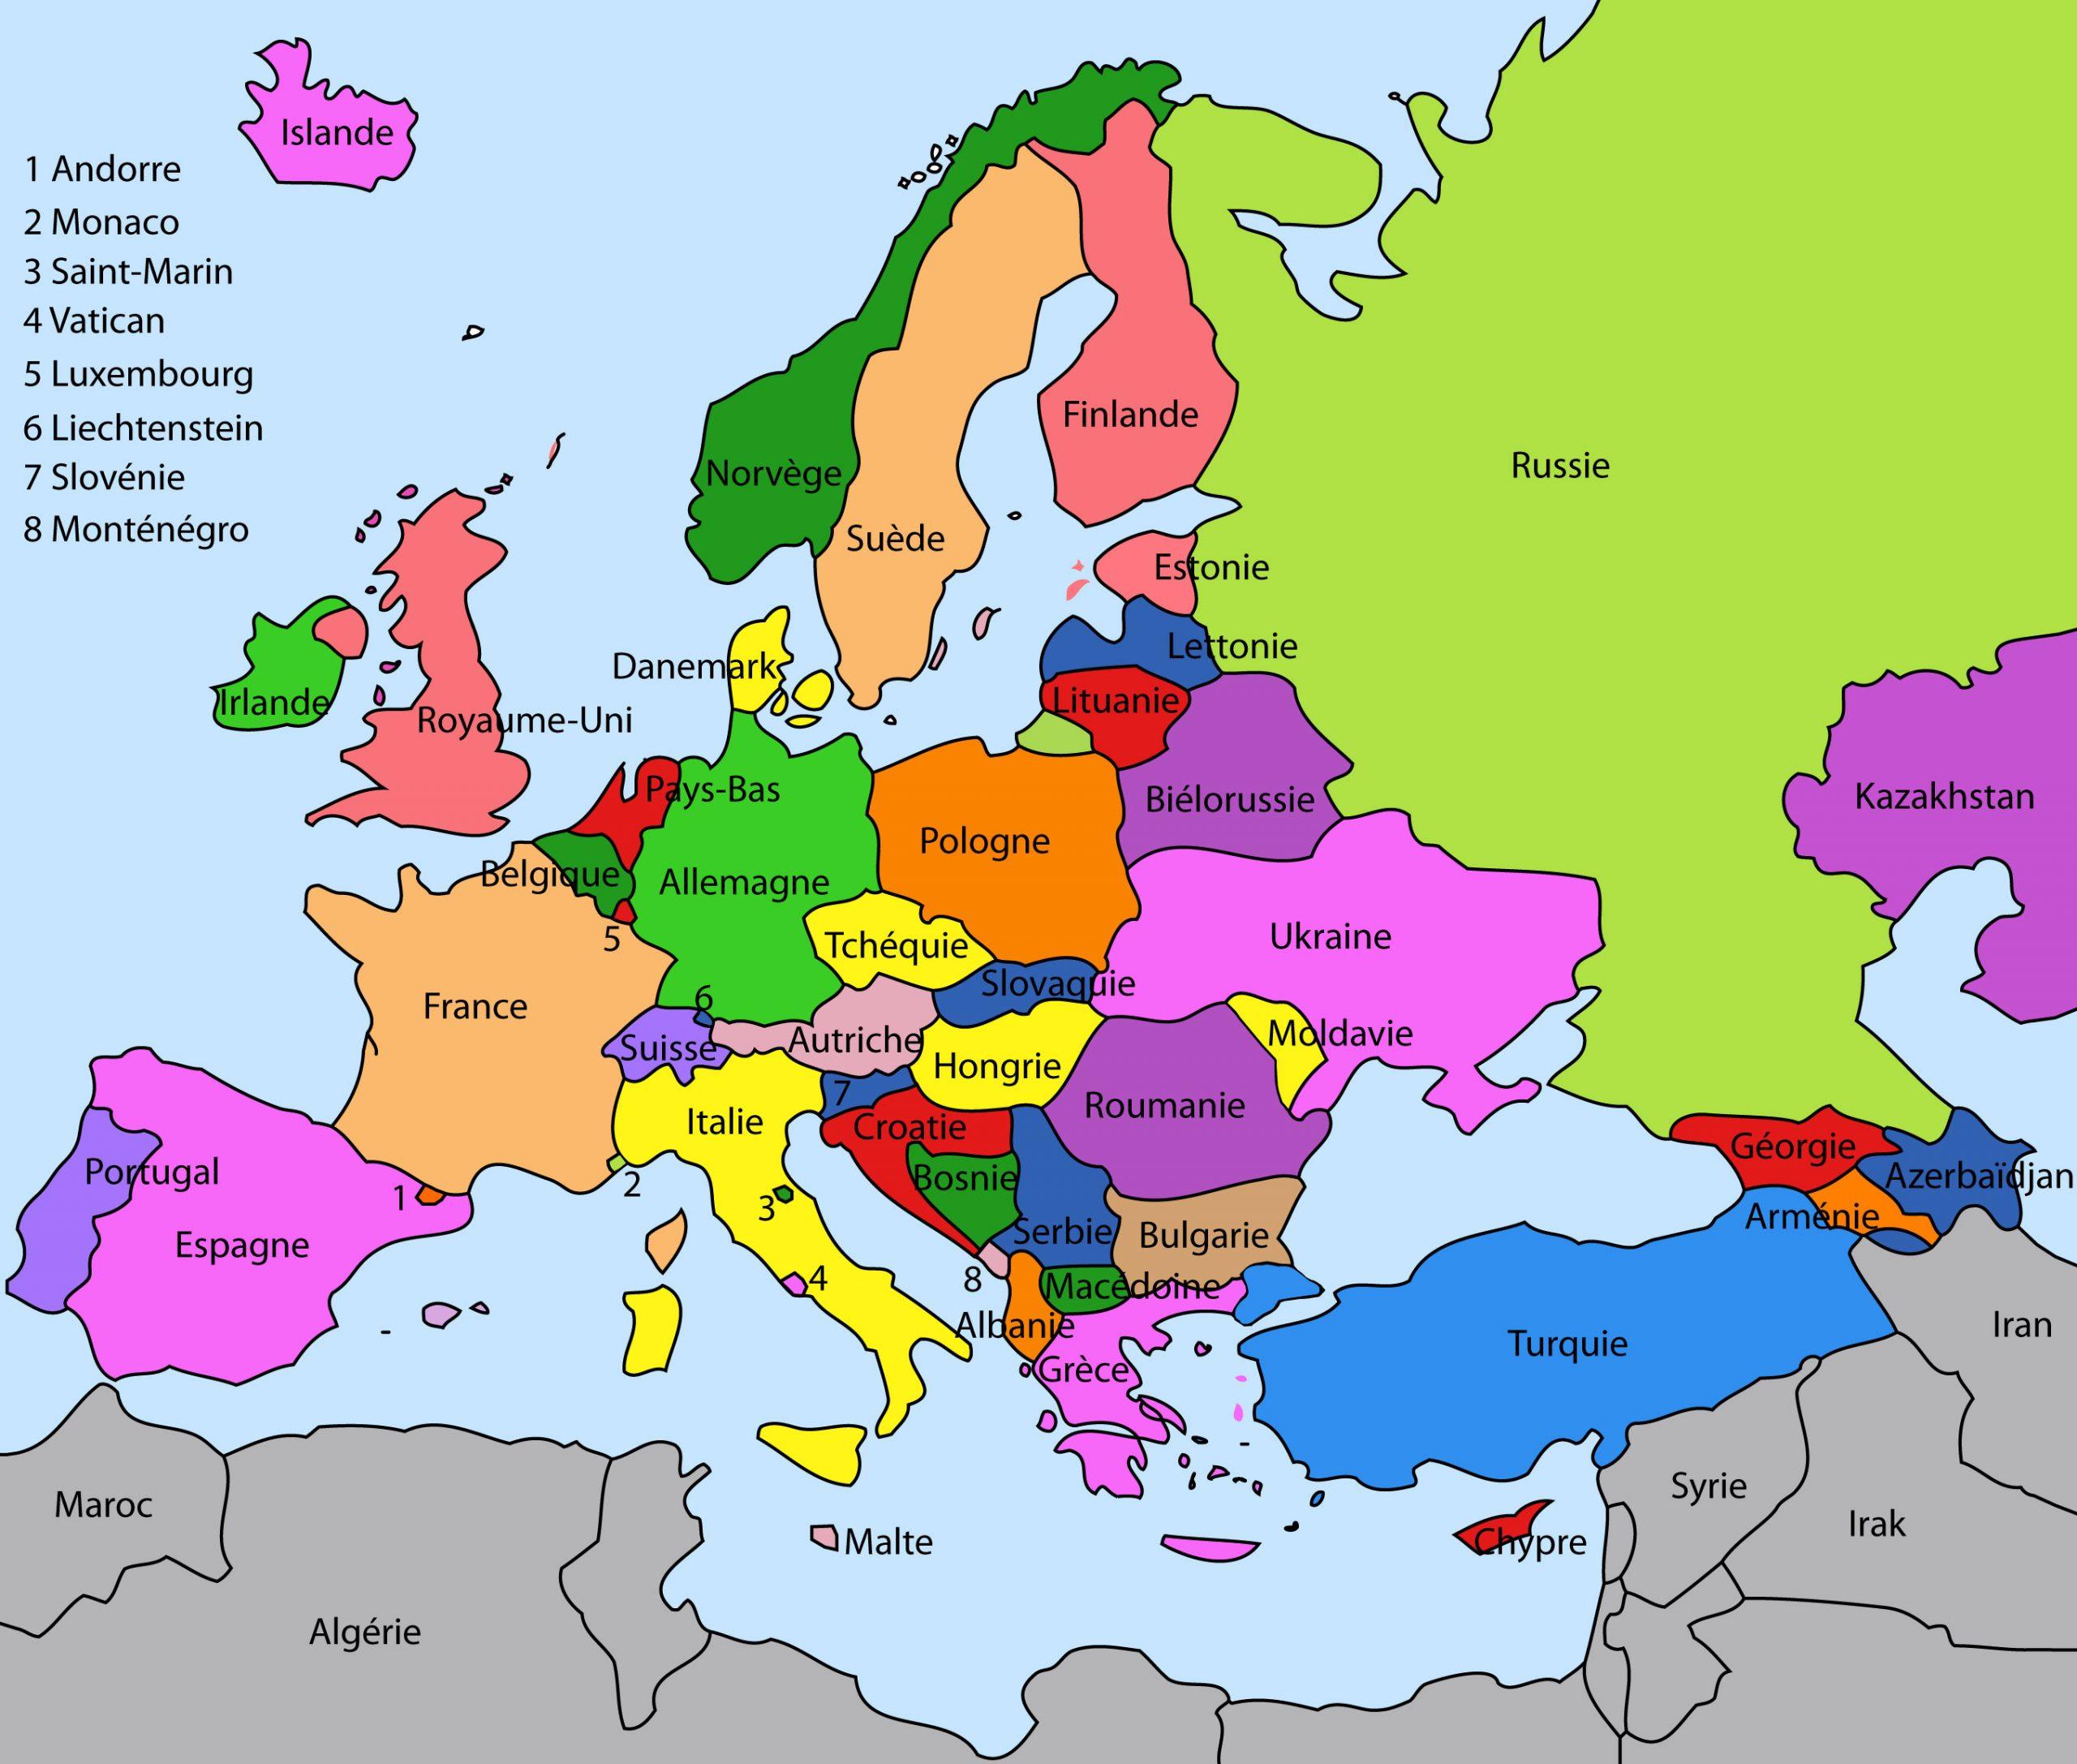 Espacoluzdiamantina: 26 Impressionnant Carte De L4Europe avec Carte De L Europe Avec Capitale